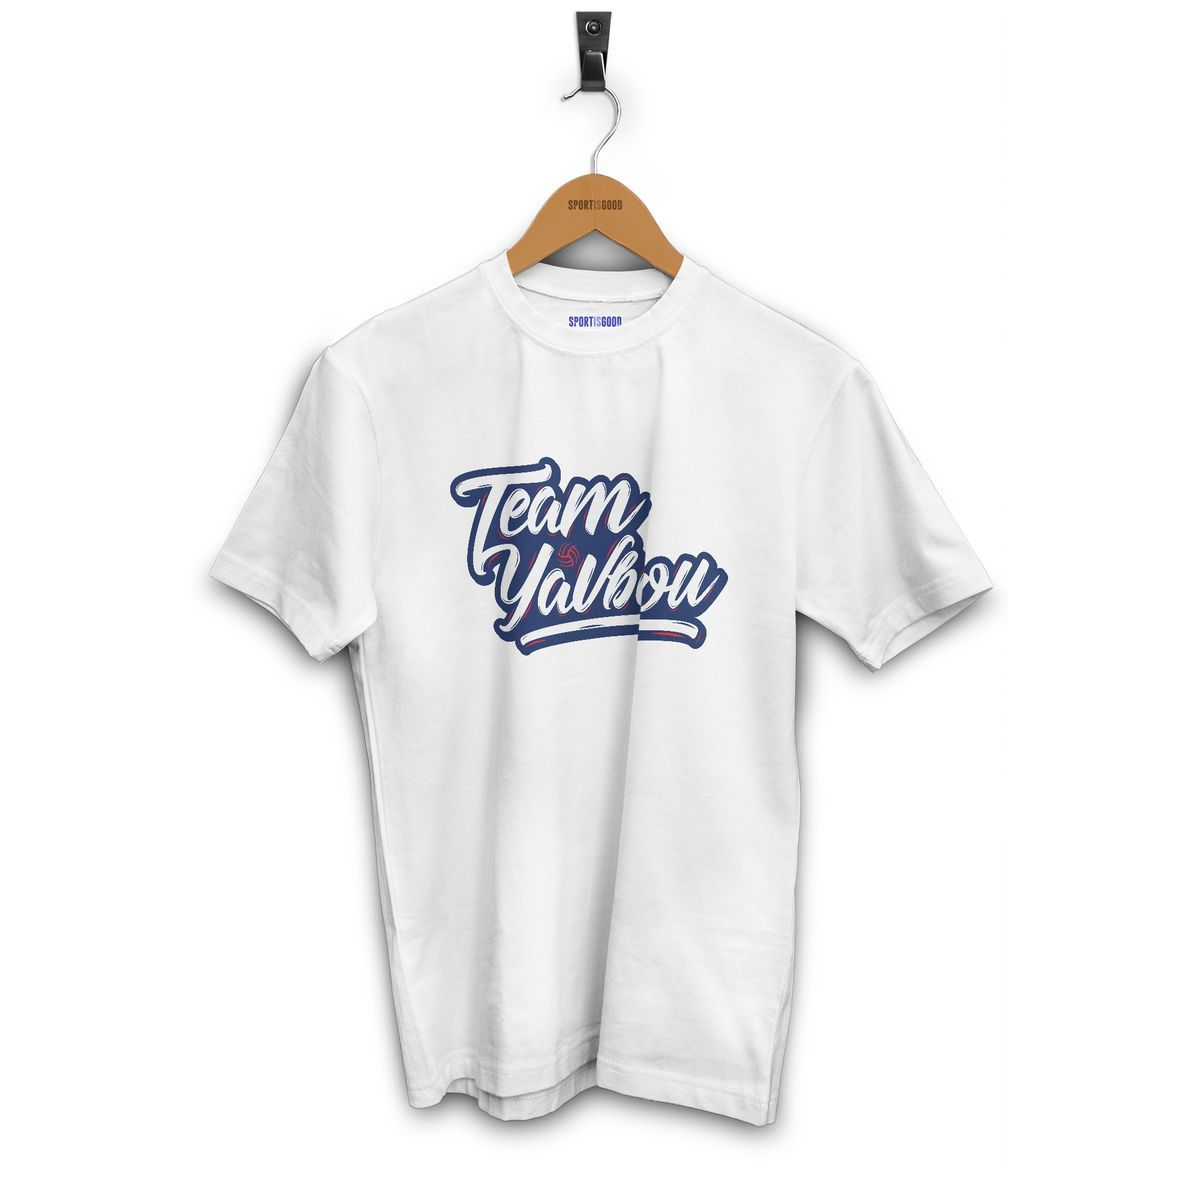 T shirt Team Yavbou Logo Taille : 1214 ans;34 ans;56